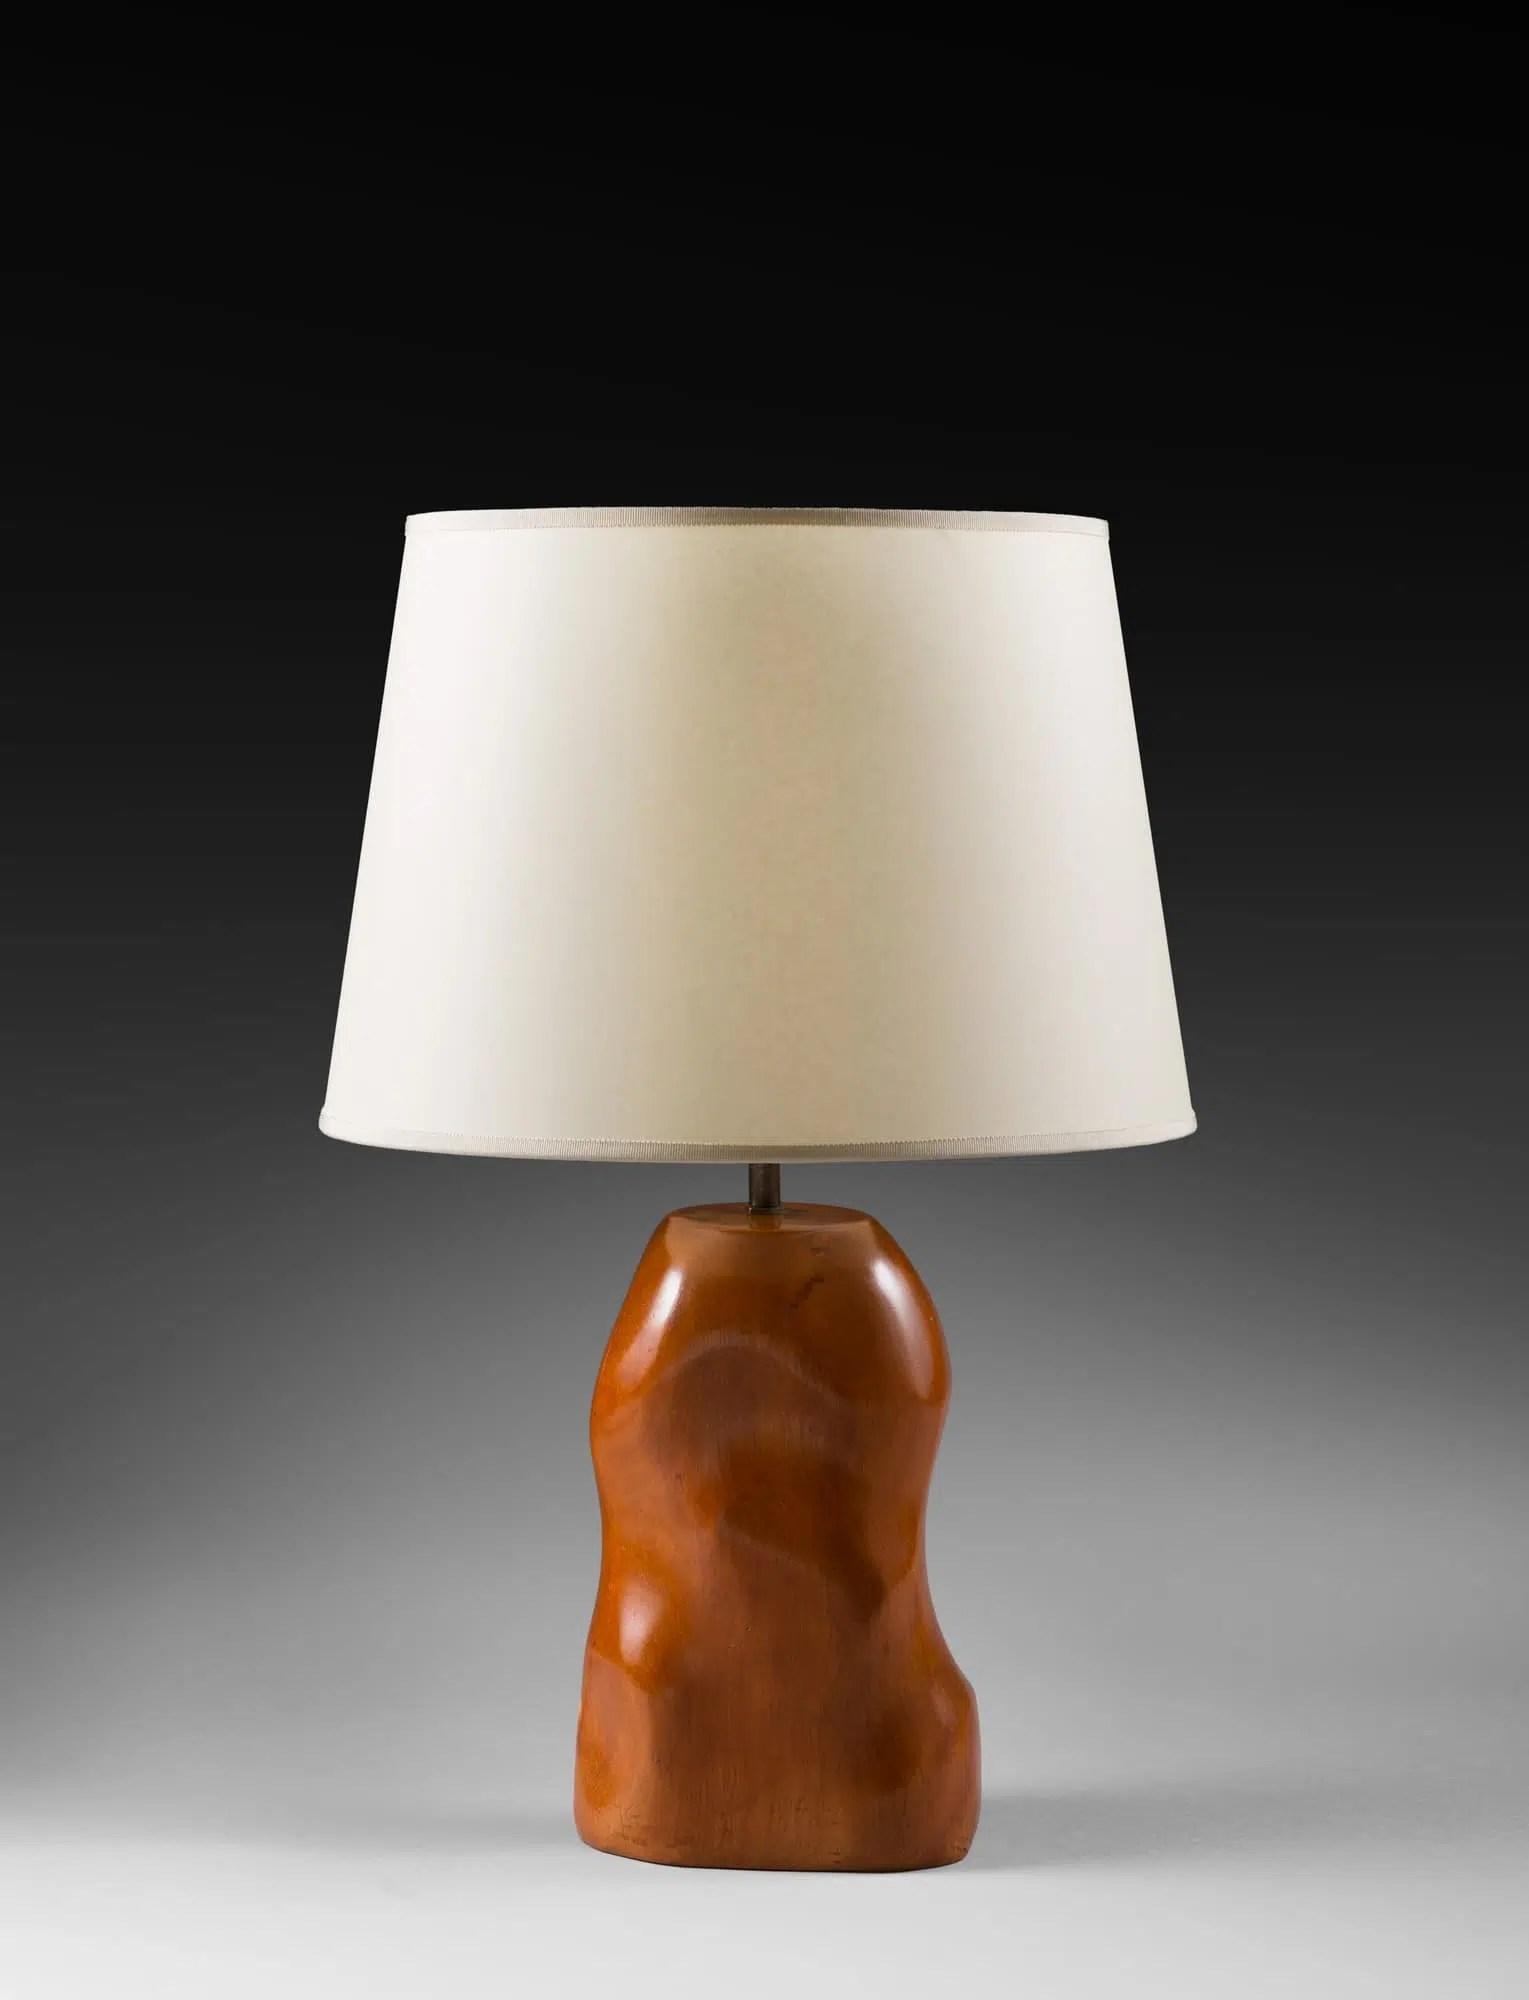 alexandre noll lampe de table vue 01